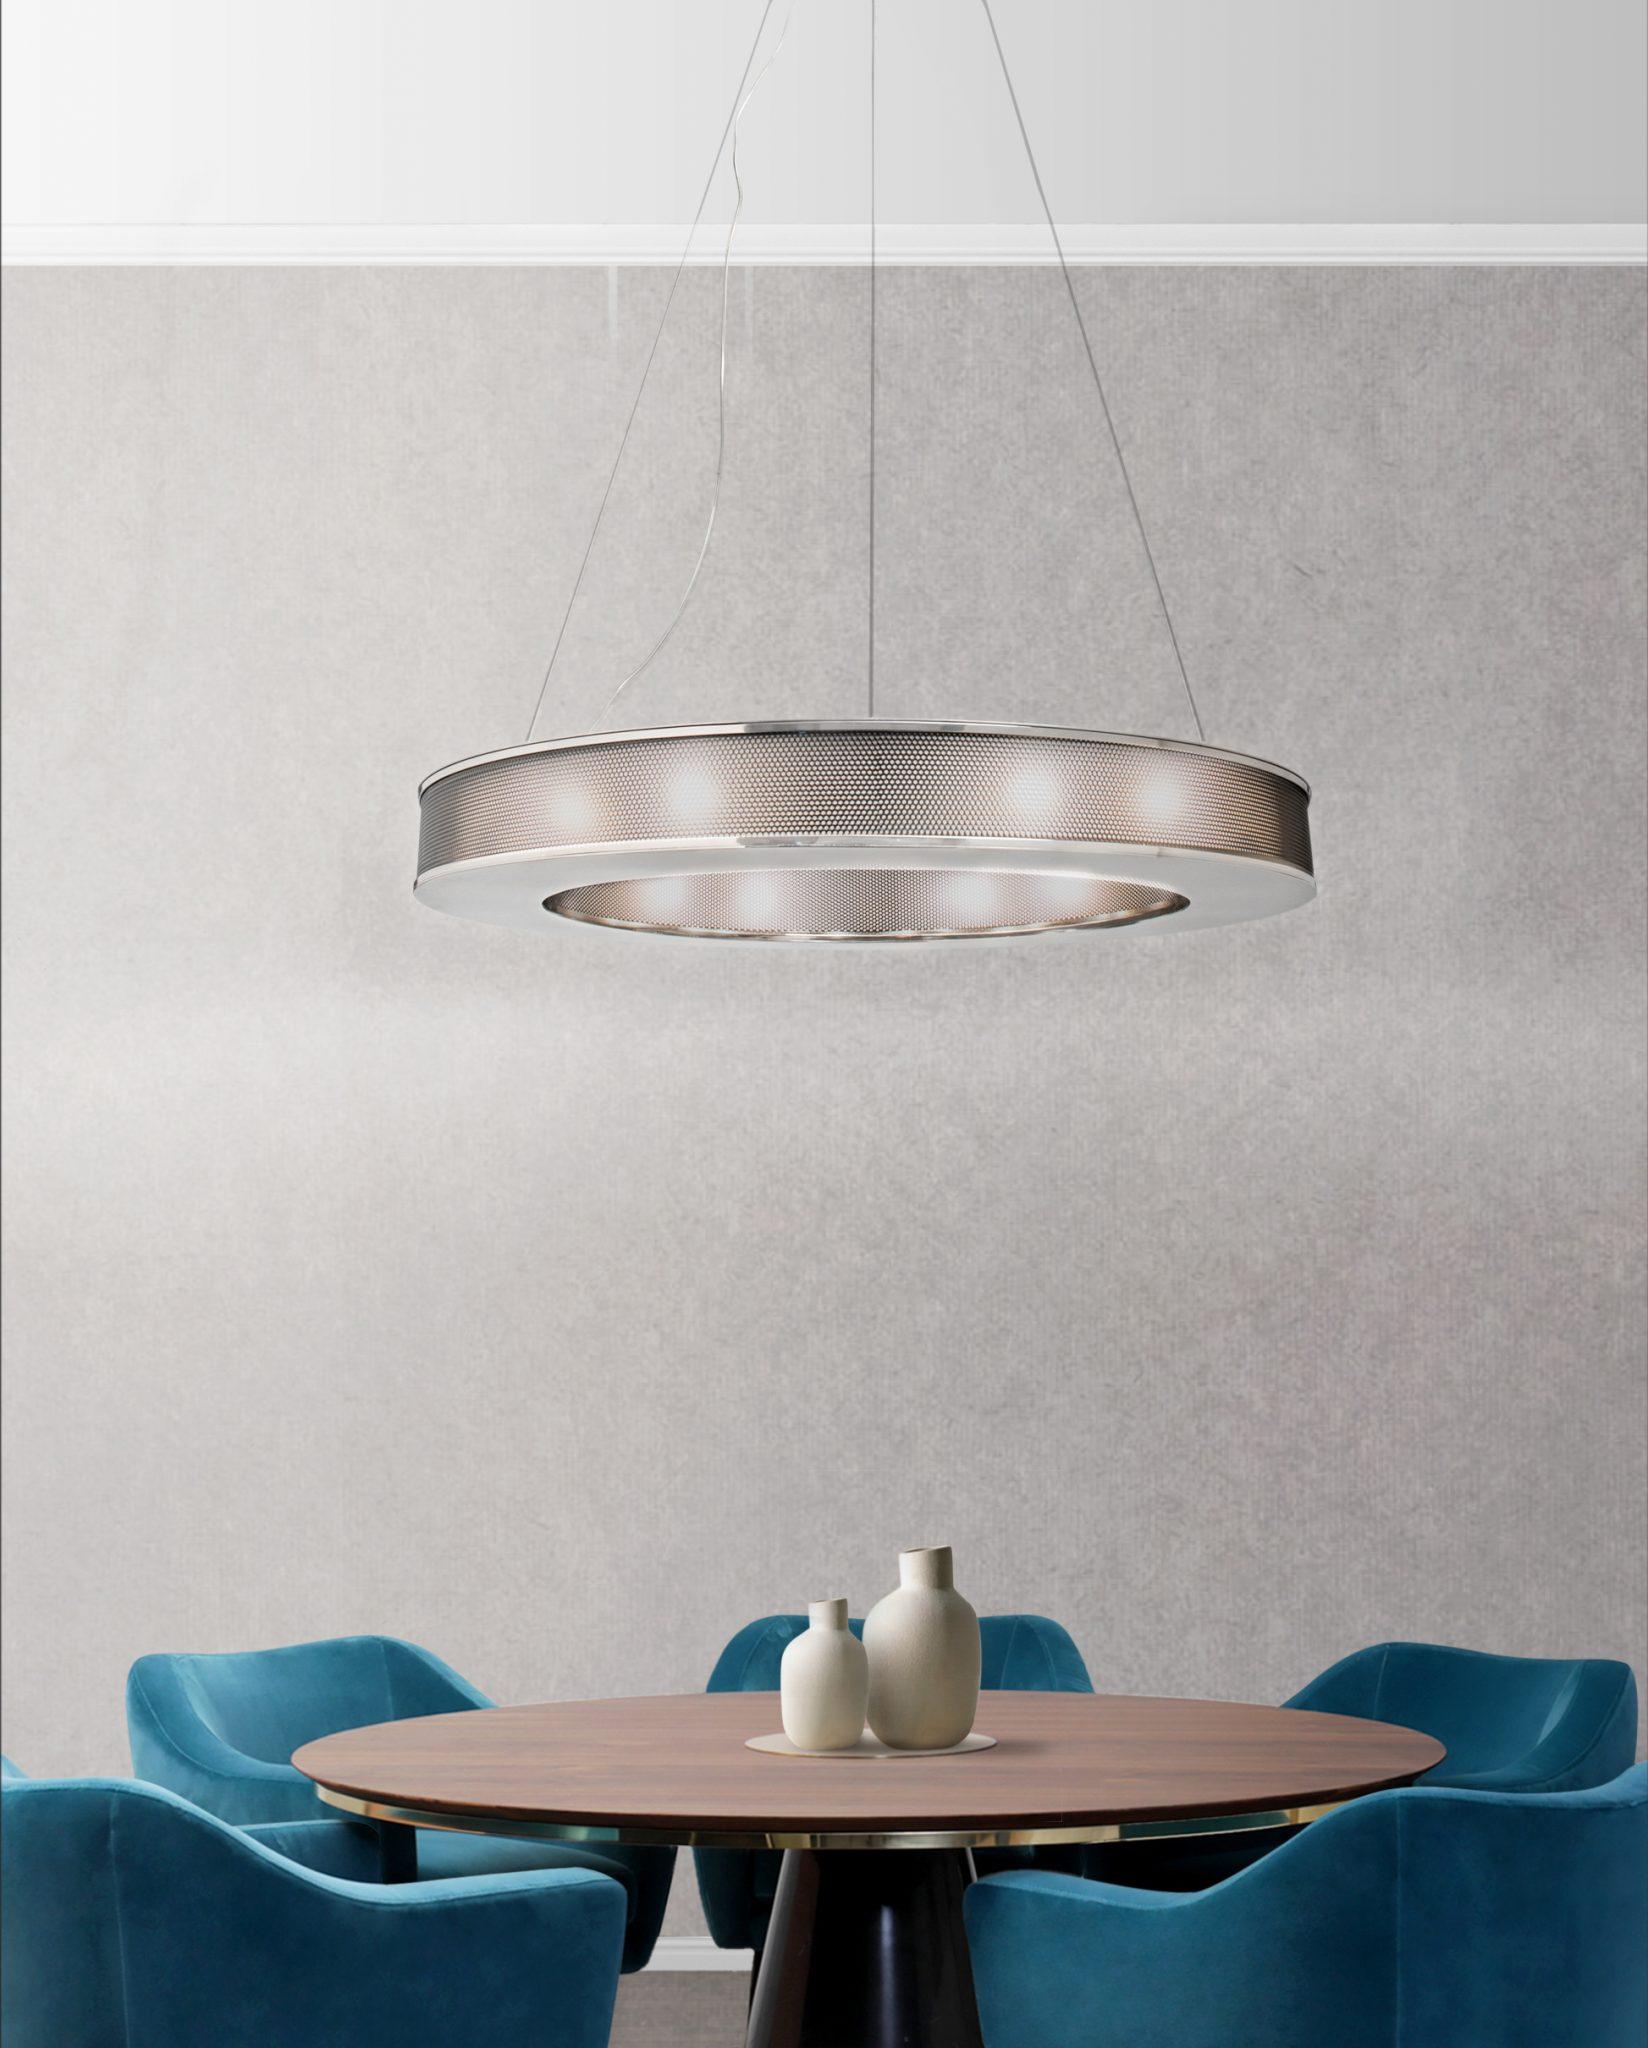 Mid-Century Modern Lighting Design for your Dining Room